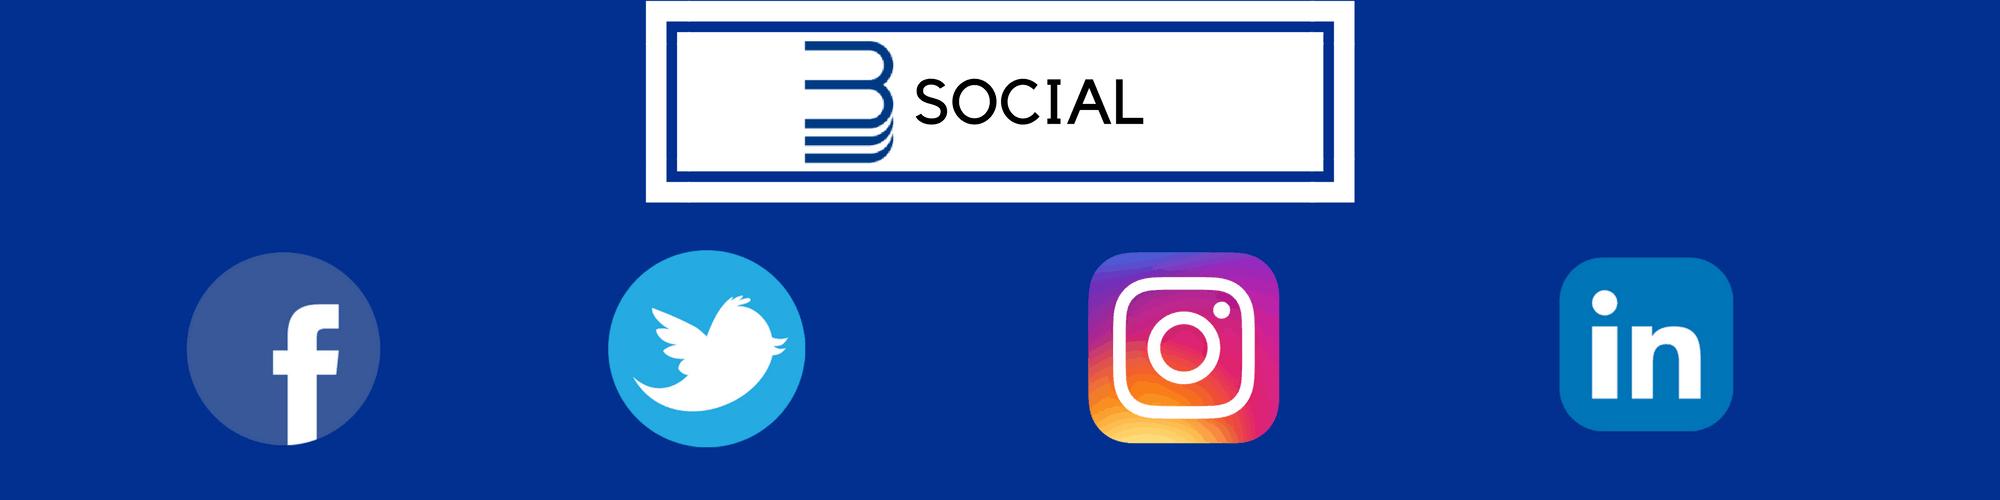 B Social!